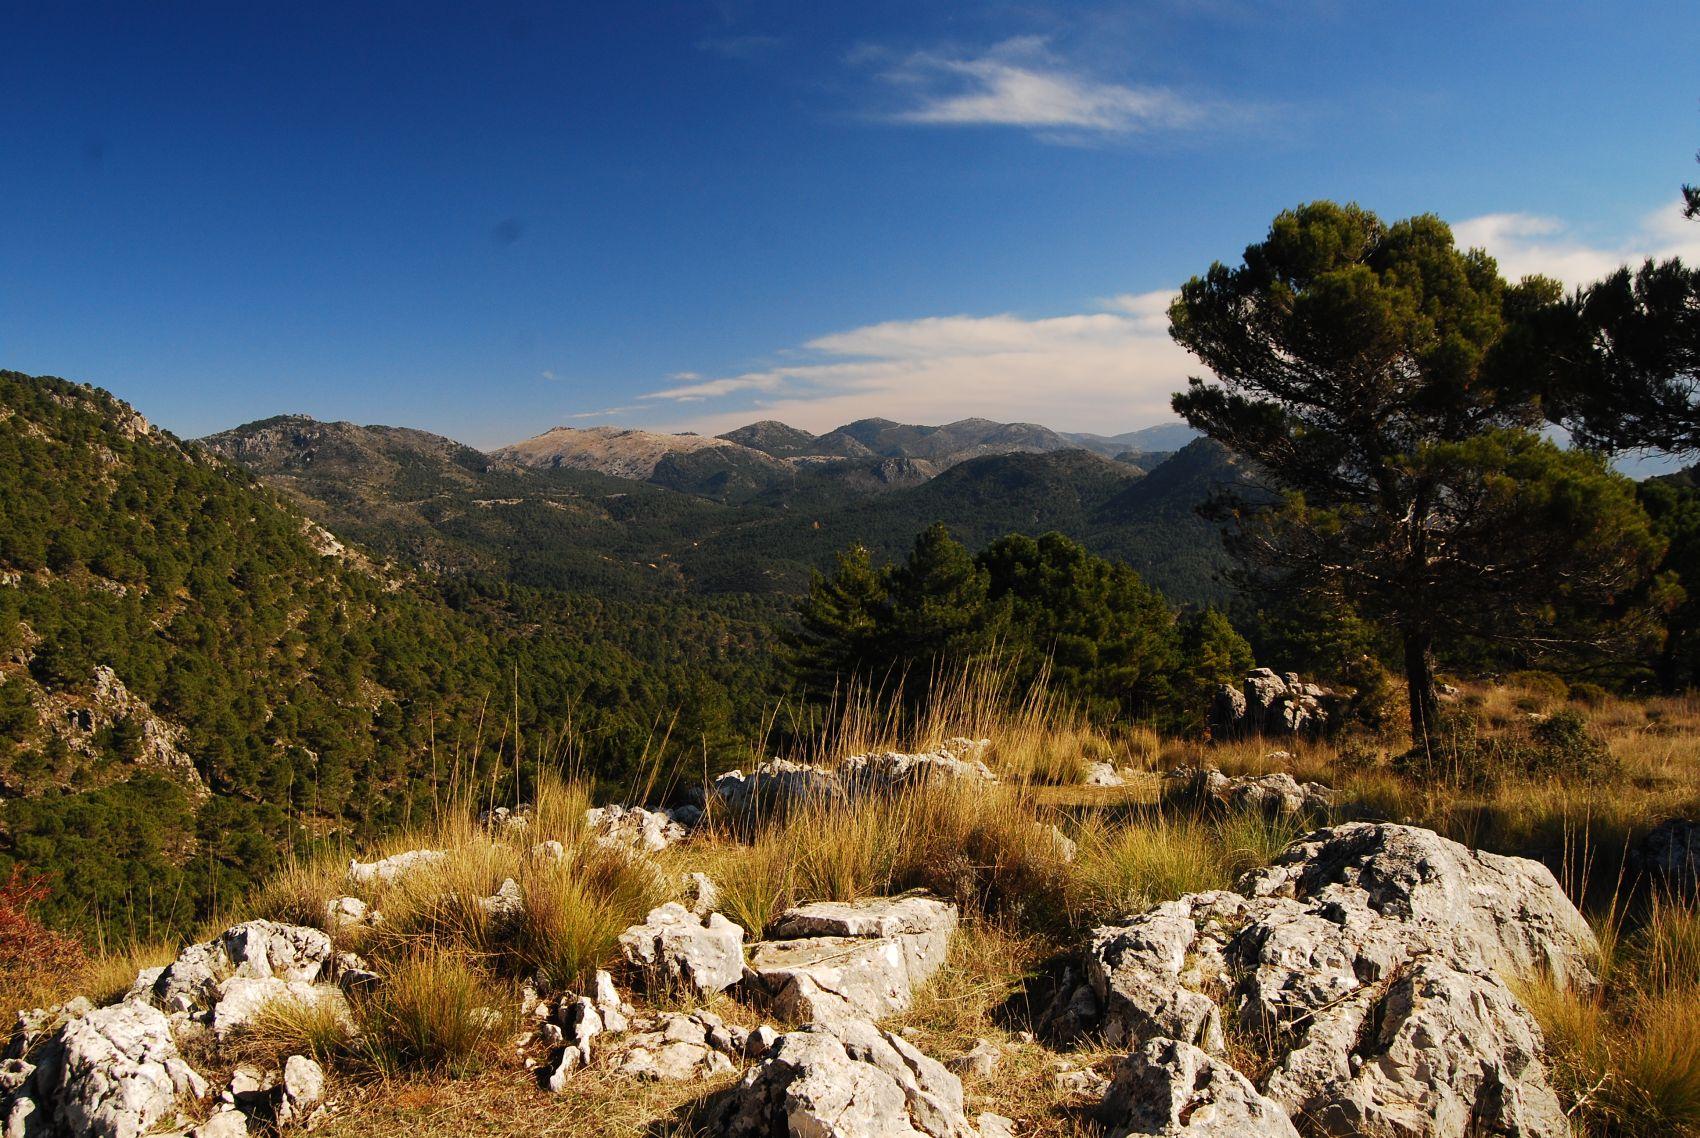 sierra-de-huetor-nature-park